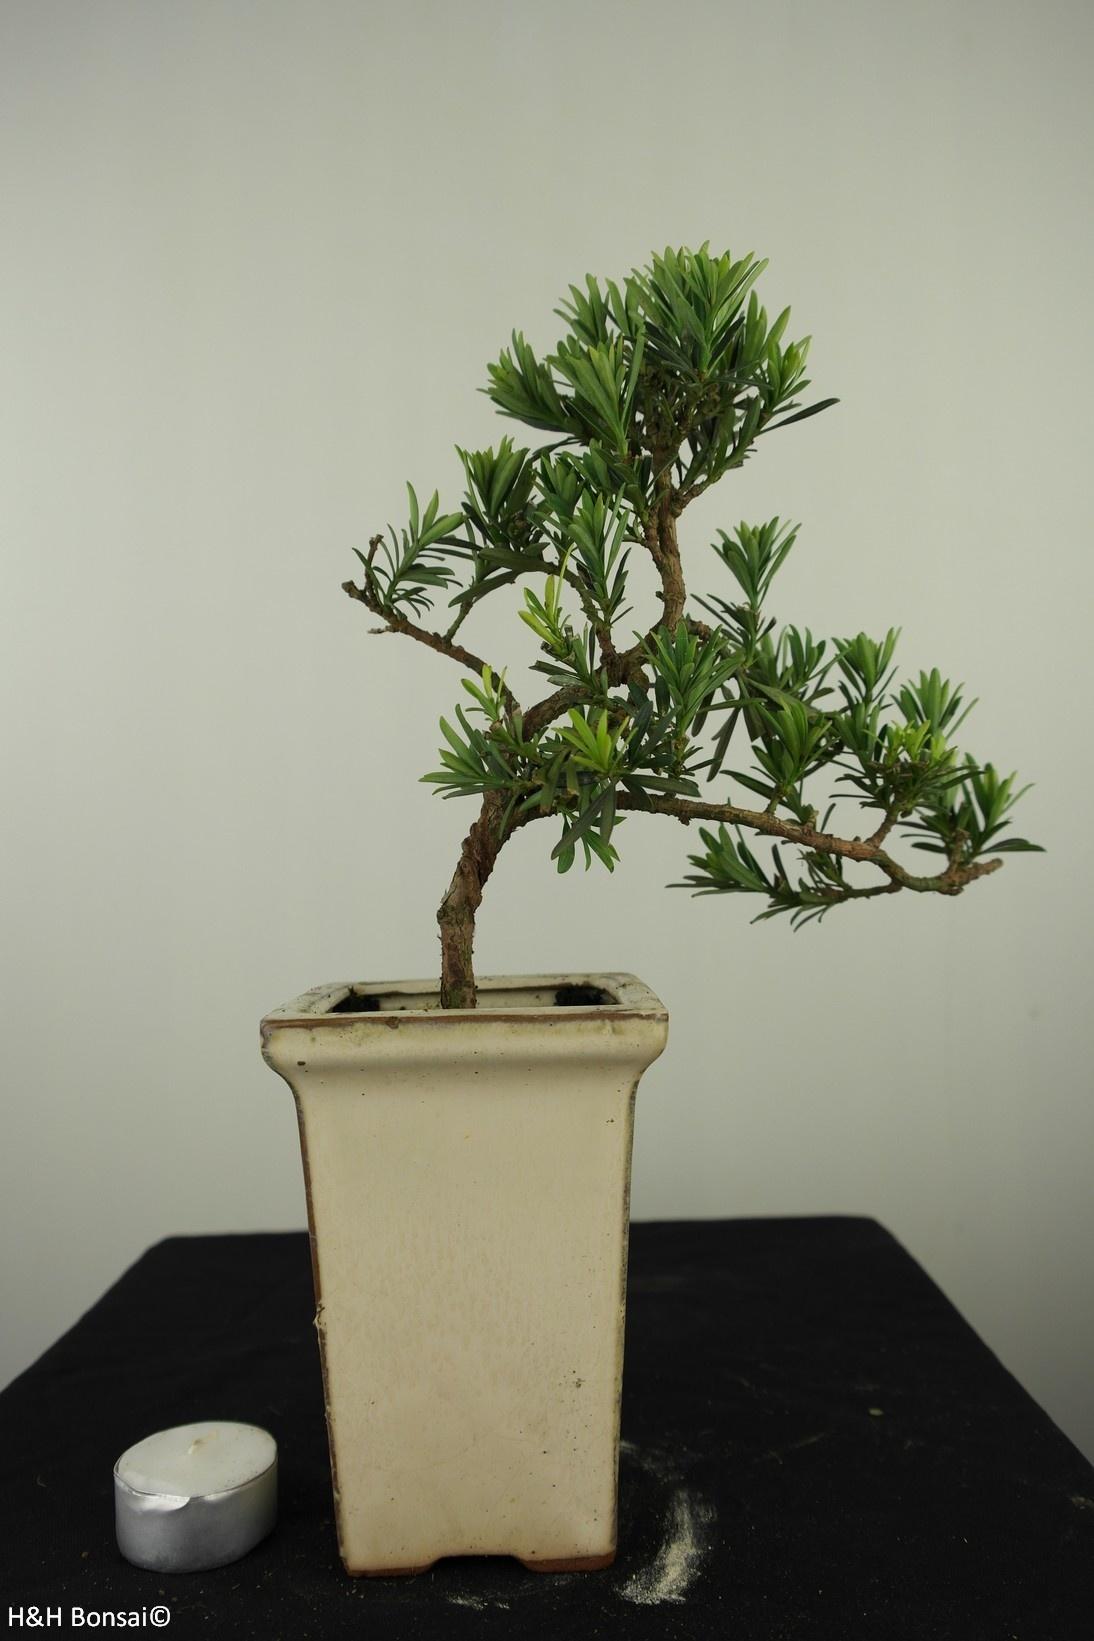 Bonsai Chin. Steineibe, Podocarpus, nr. 7598